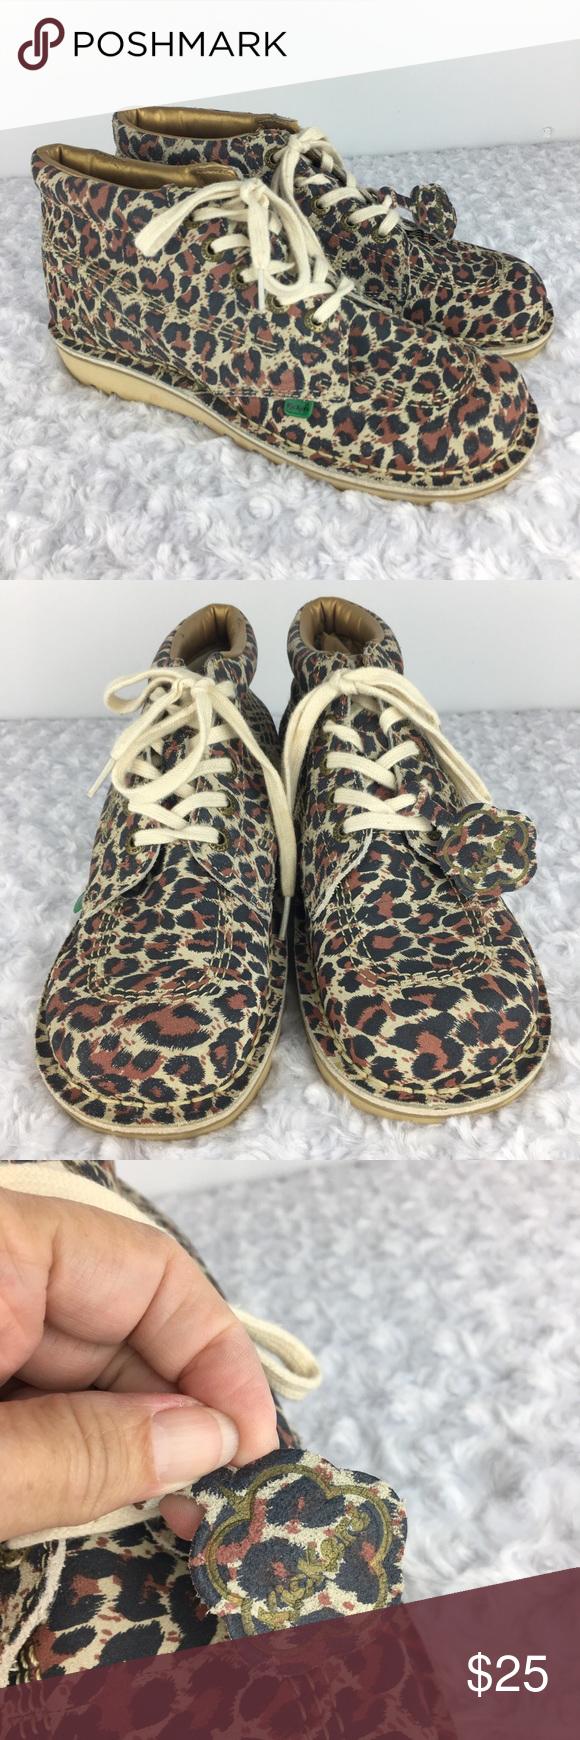 Kickers Leopard Print High Tops | High